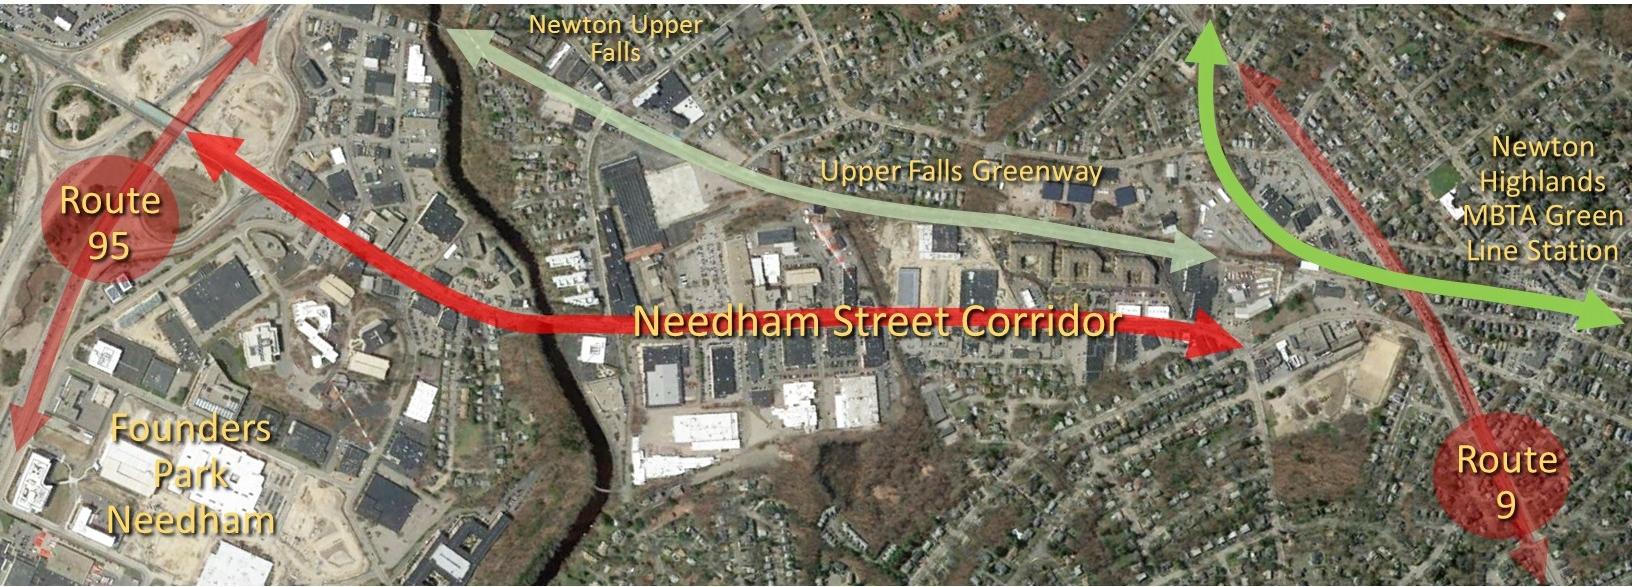 Needham Street Diagram 2.jpg